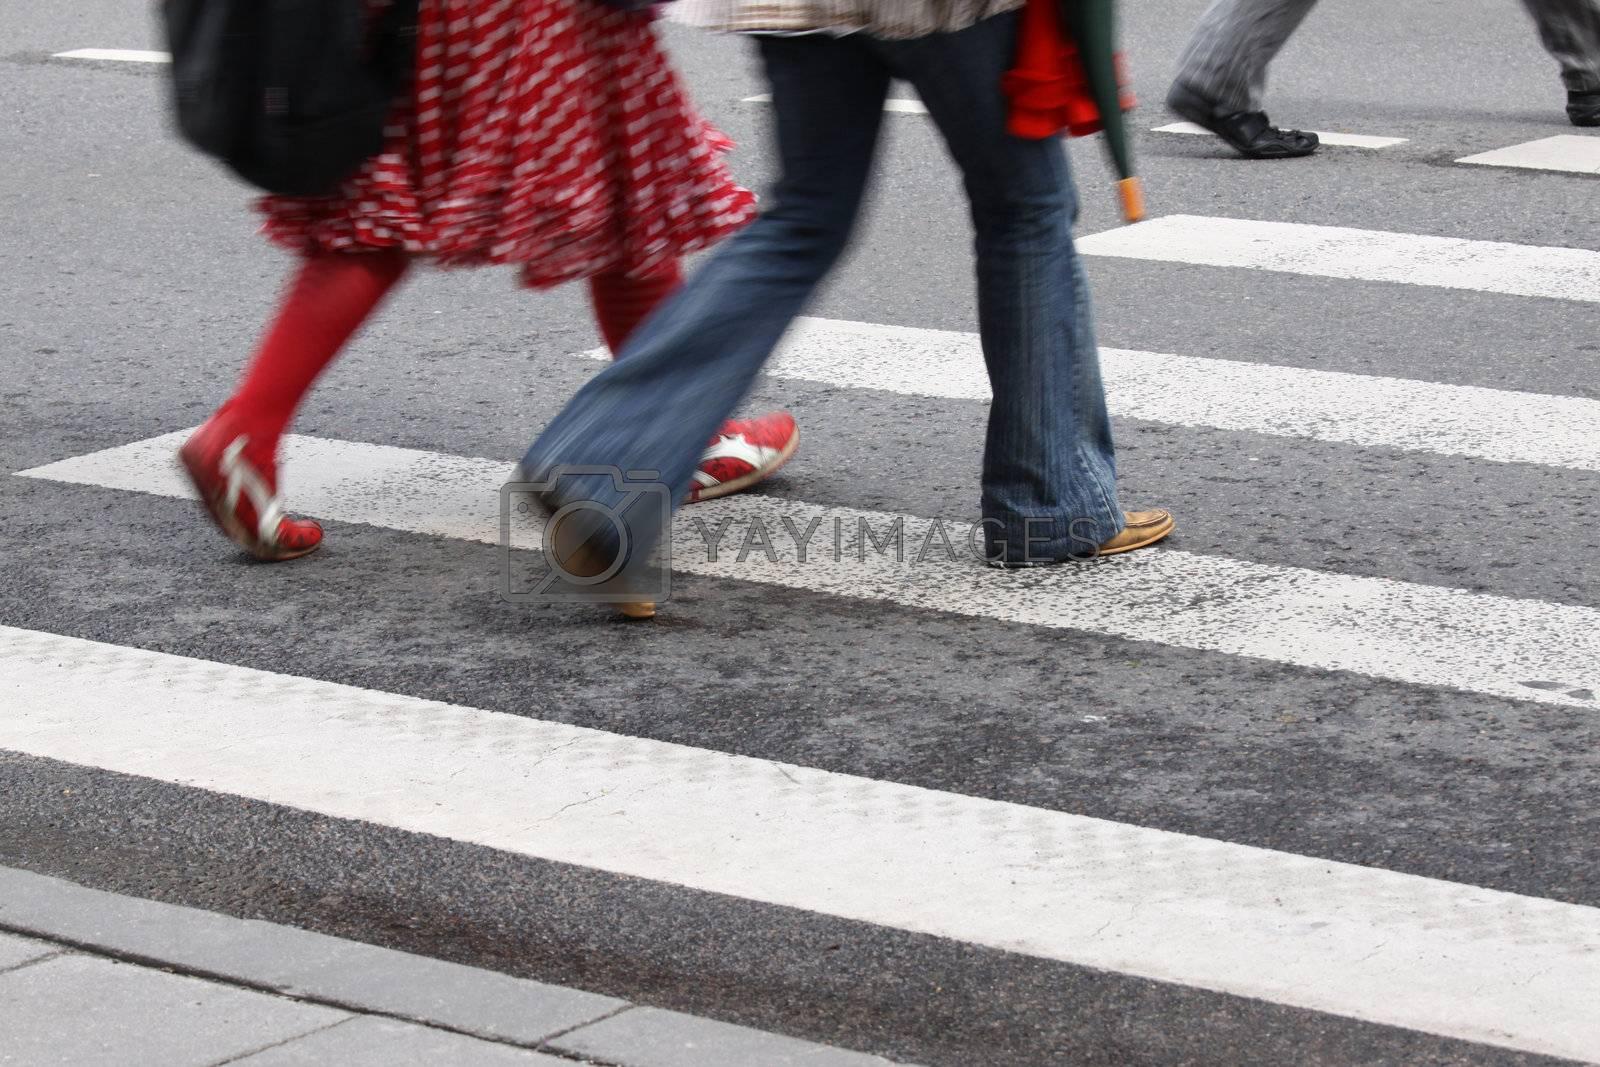 Horizontal picture of blurred pedestrians crossing crosswalk